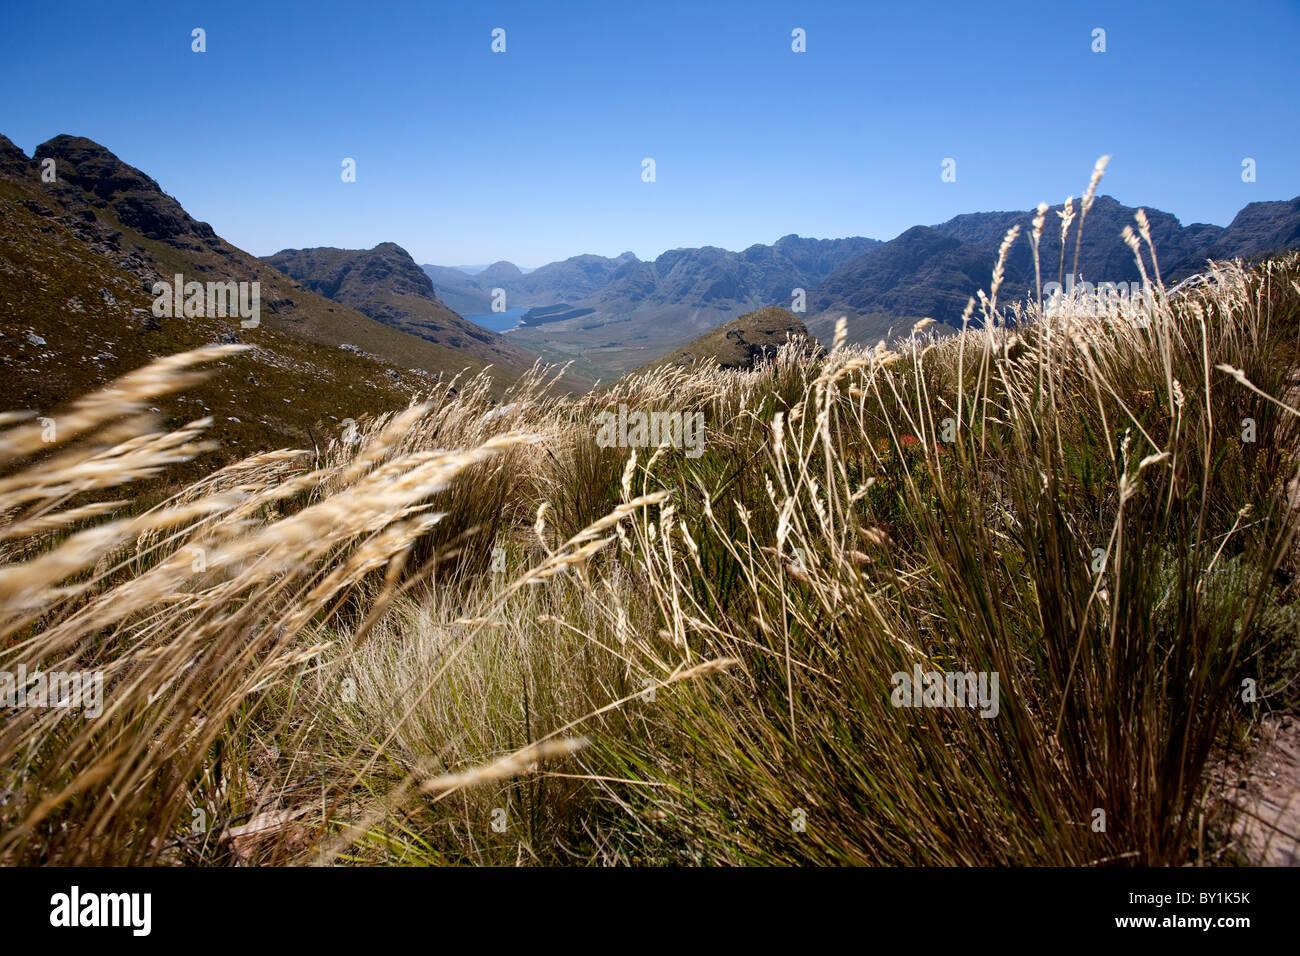 South Africa Fynbos Stock Photos & South Africa Fynbos Stock Images ...